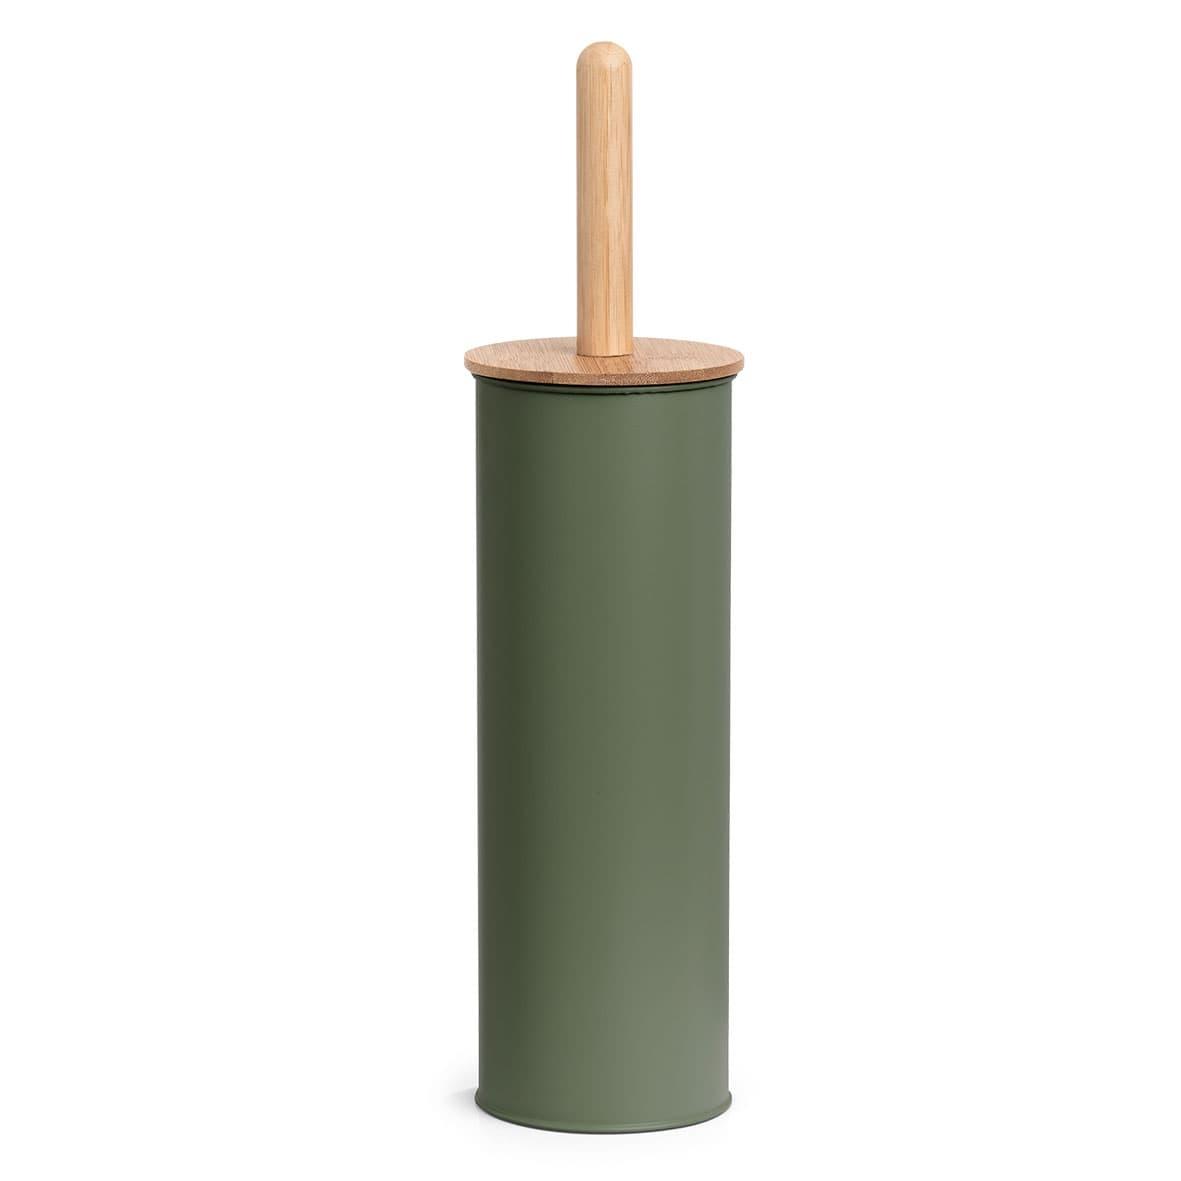 Perie de toaleta cu suport din metal, Shade III Verde Inchis, Ø10xH38,4 cm somproduct.ro